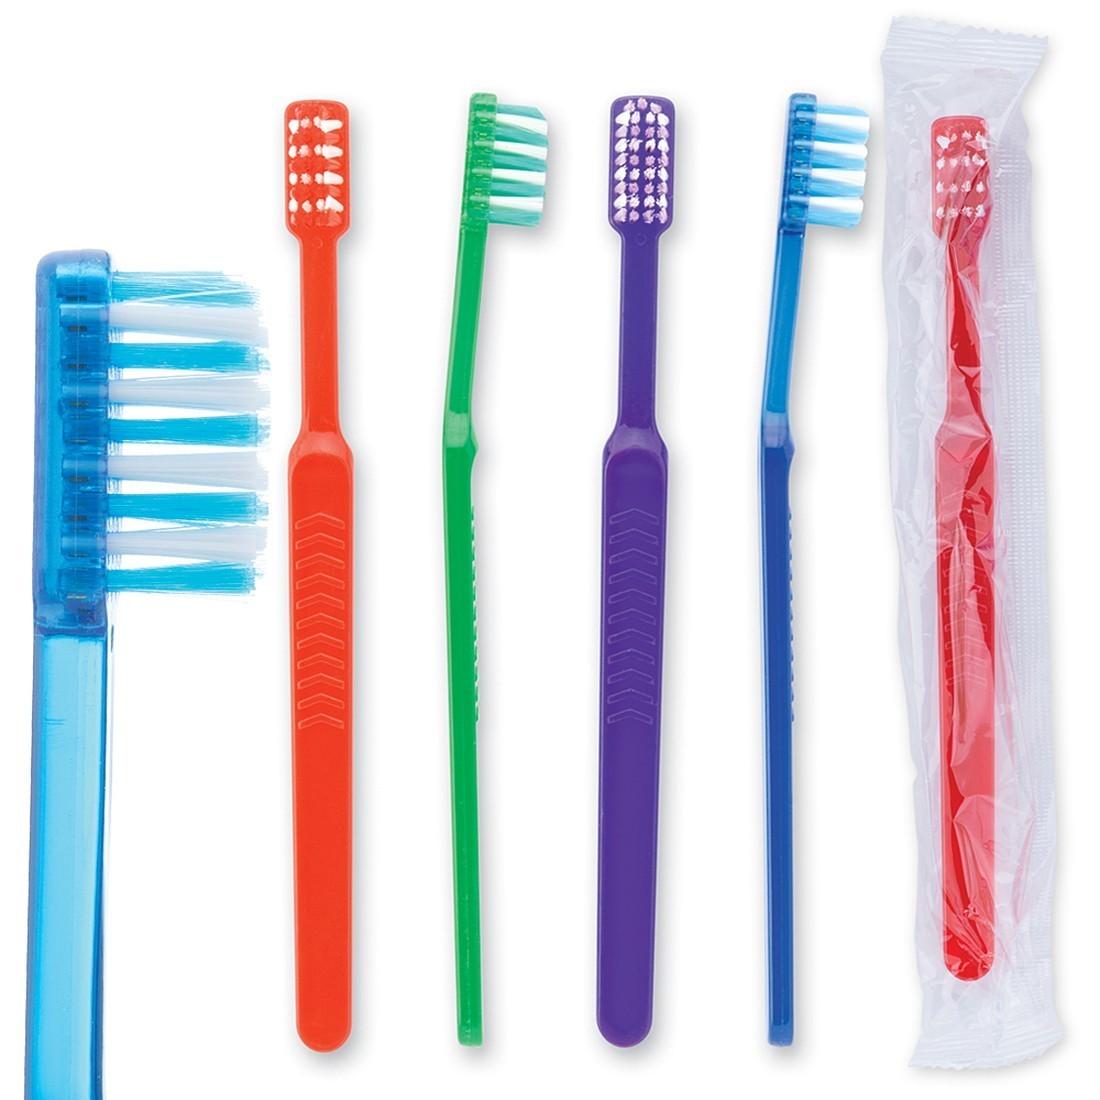 OraLine Pre-teen Orthodontic V-Trim Toothbrush [image]